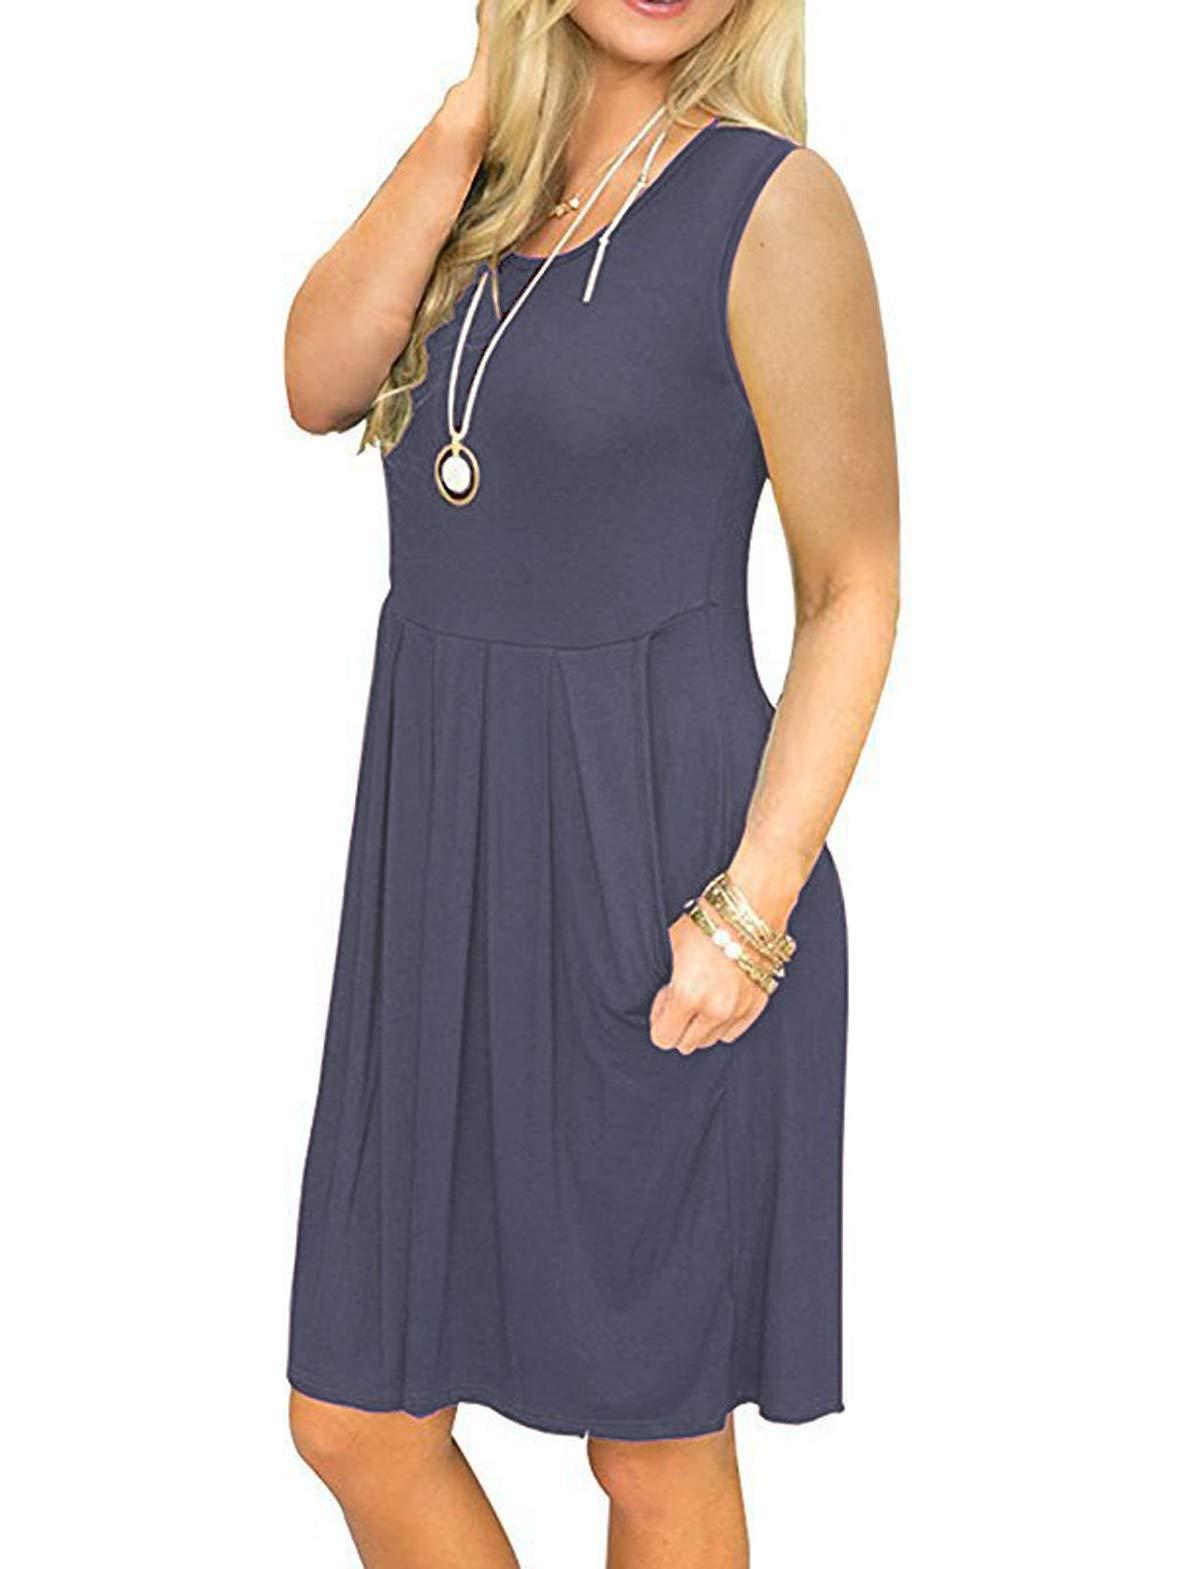 HUALAIMEI Women\'s Summer Sleeveless Knee Length Tanks Casual Midi Dresses